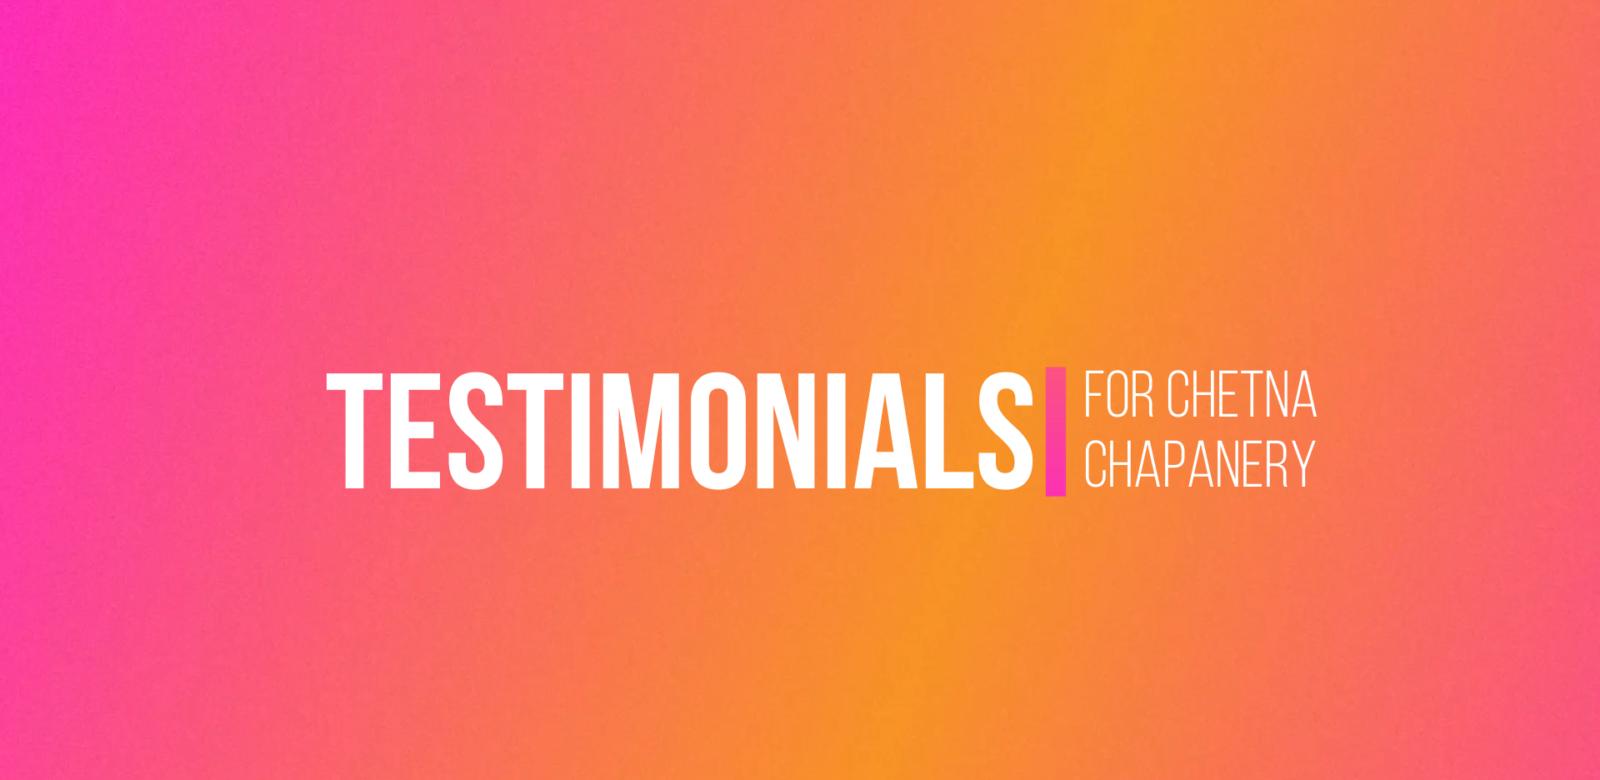 Testimonials for Chetna Chapanery